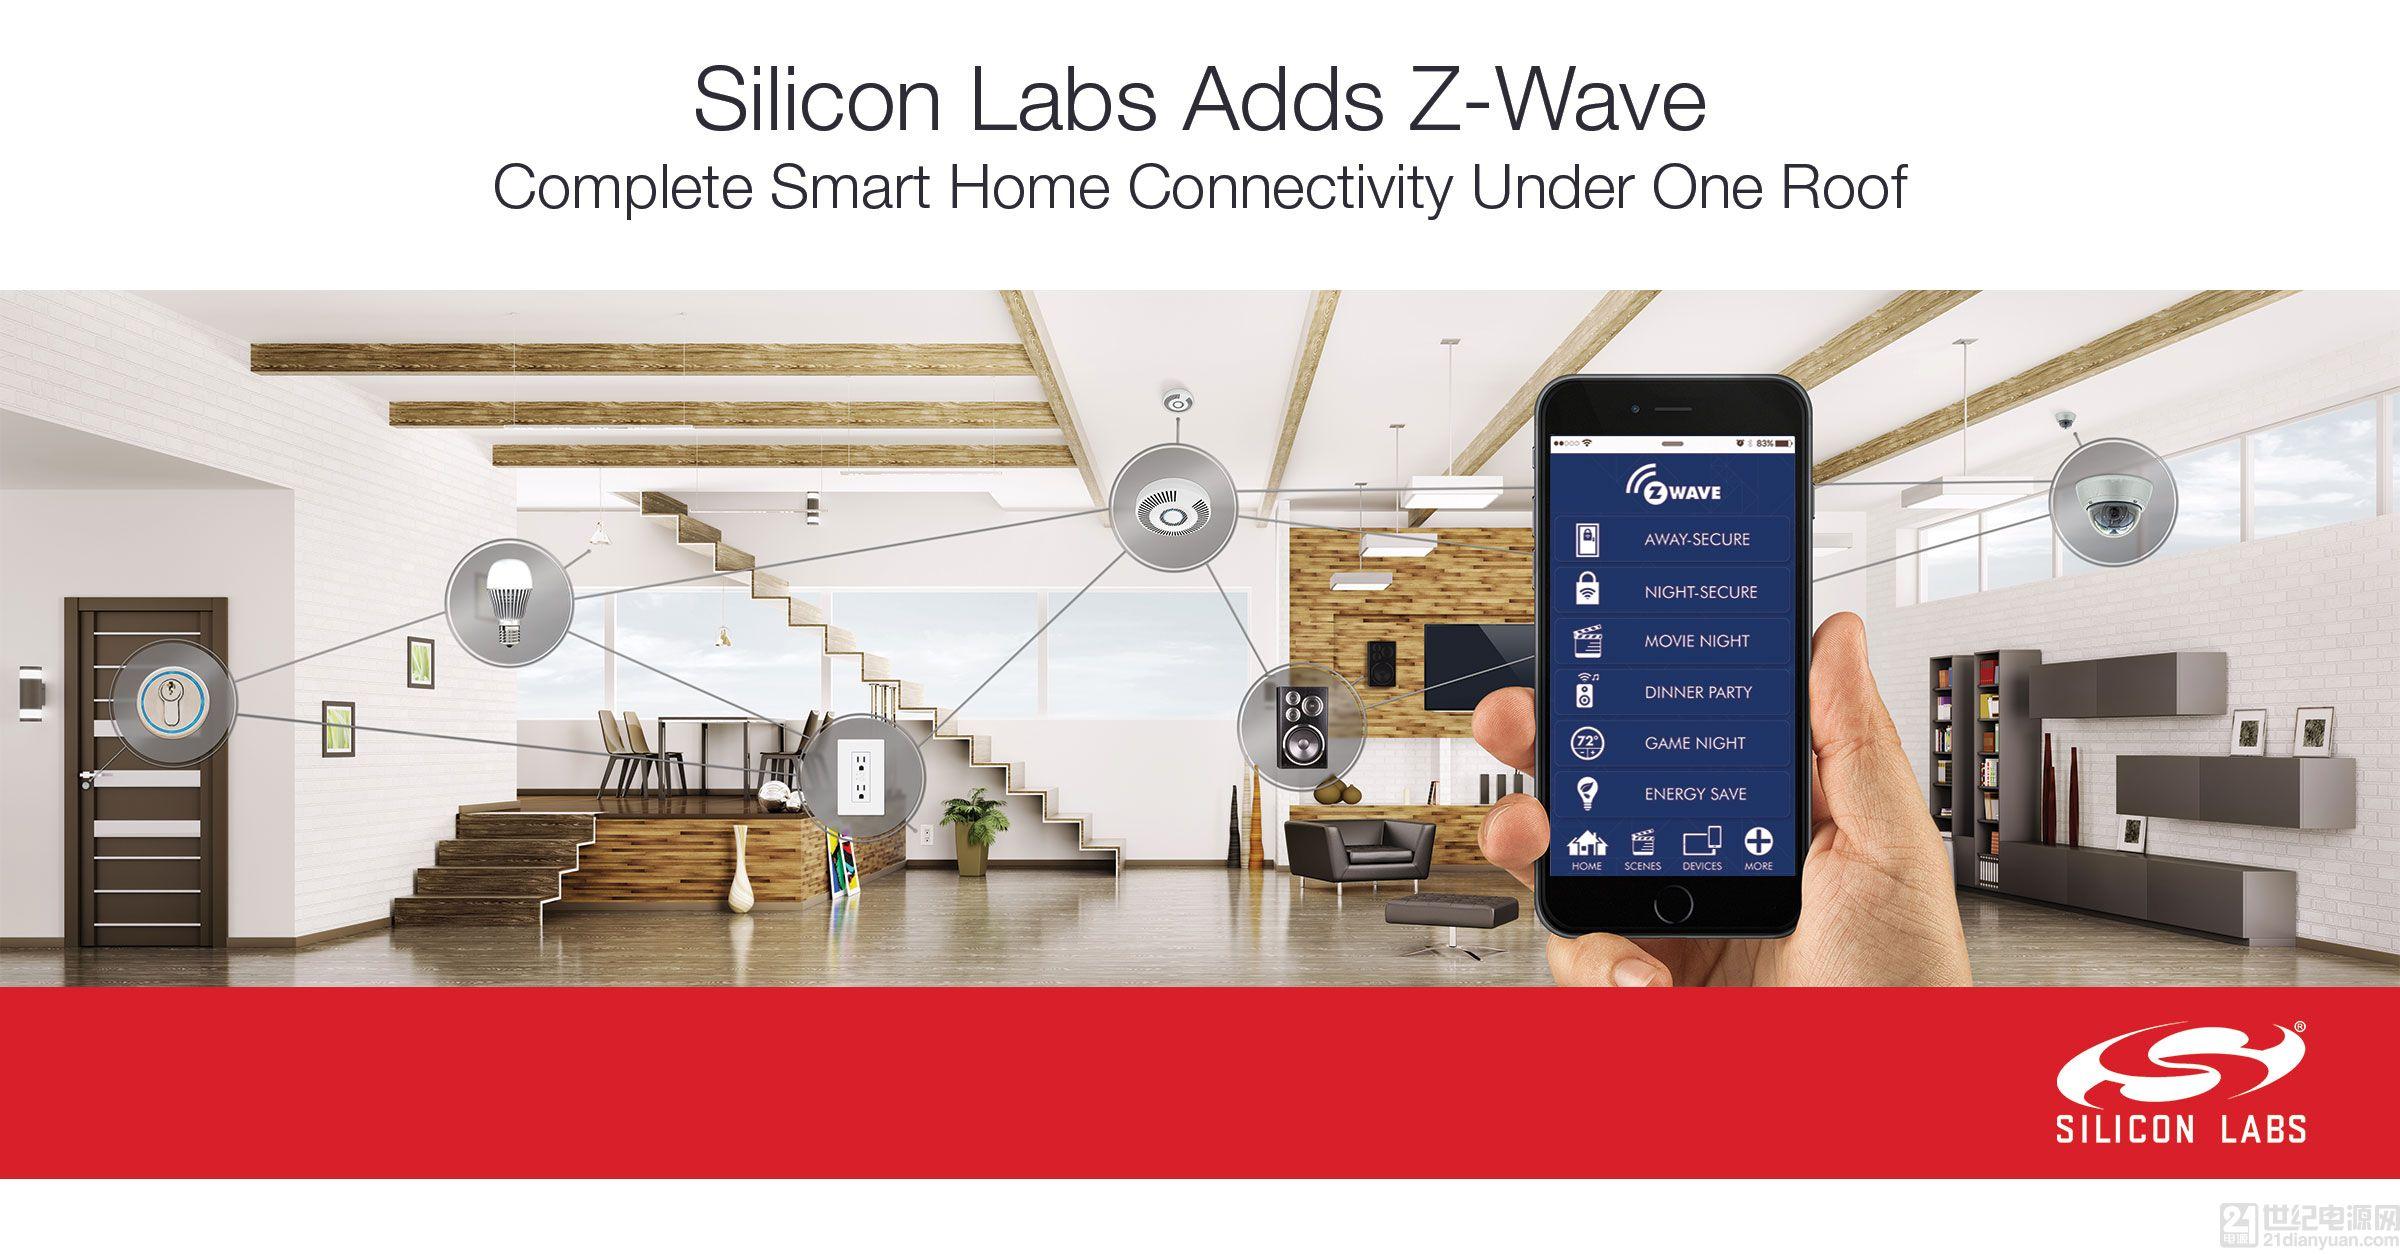 Silicon Labs 完成对 Sigma Designs 公司 Z-Wave 事业单位的收购,广泛部署的网状网络技术以强化公司在智能家居领域的领先地位